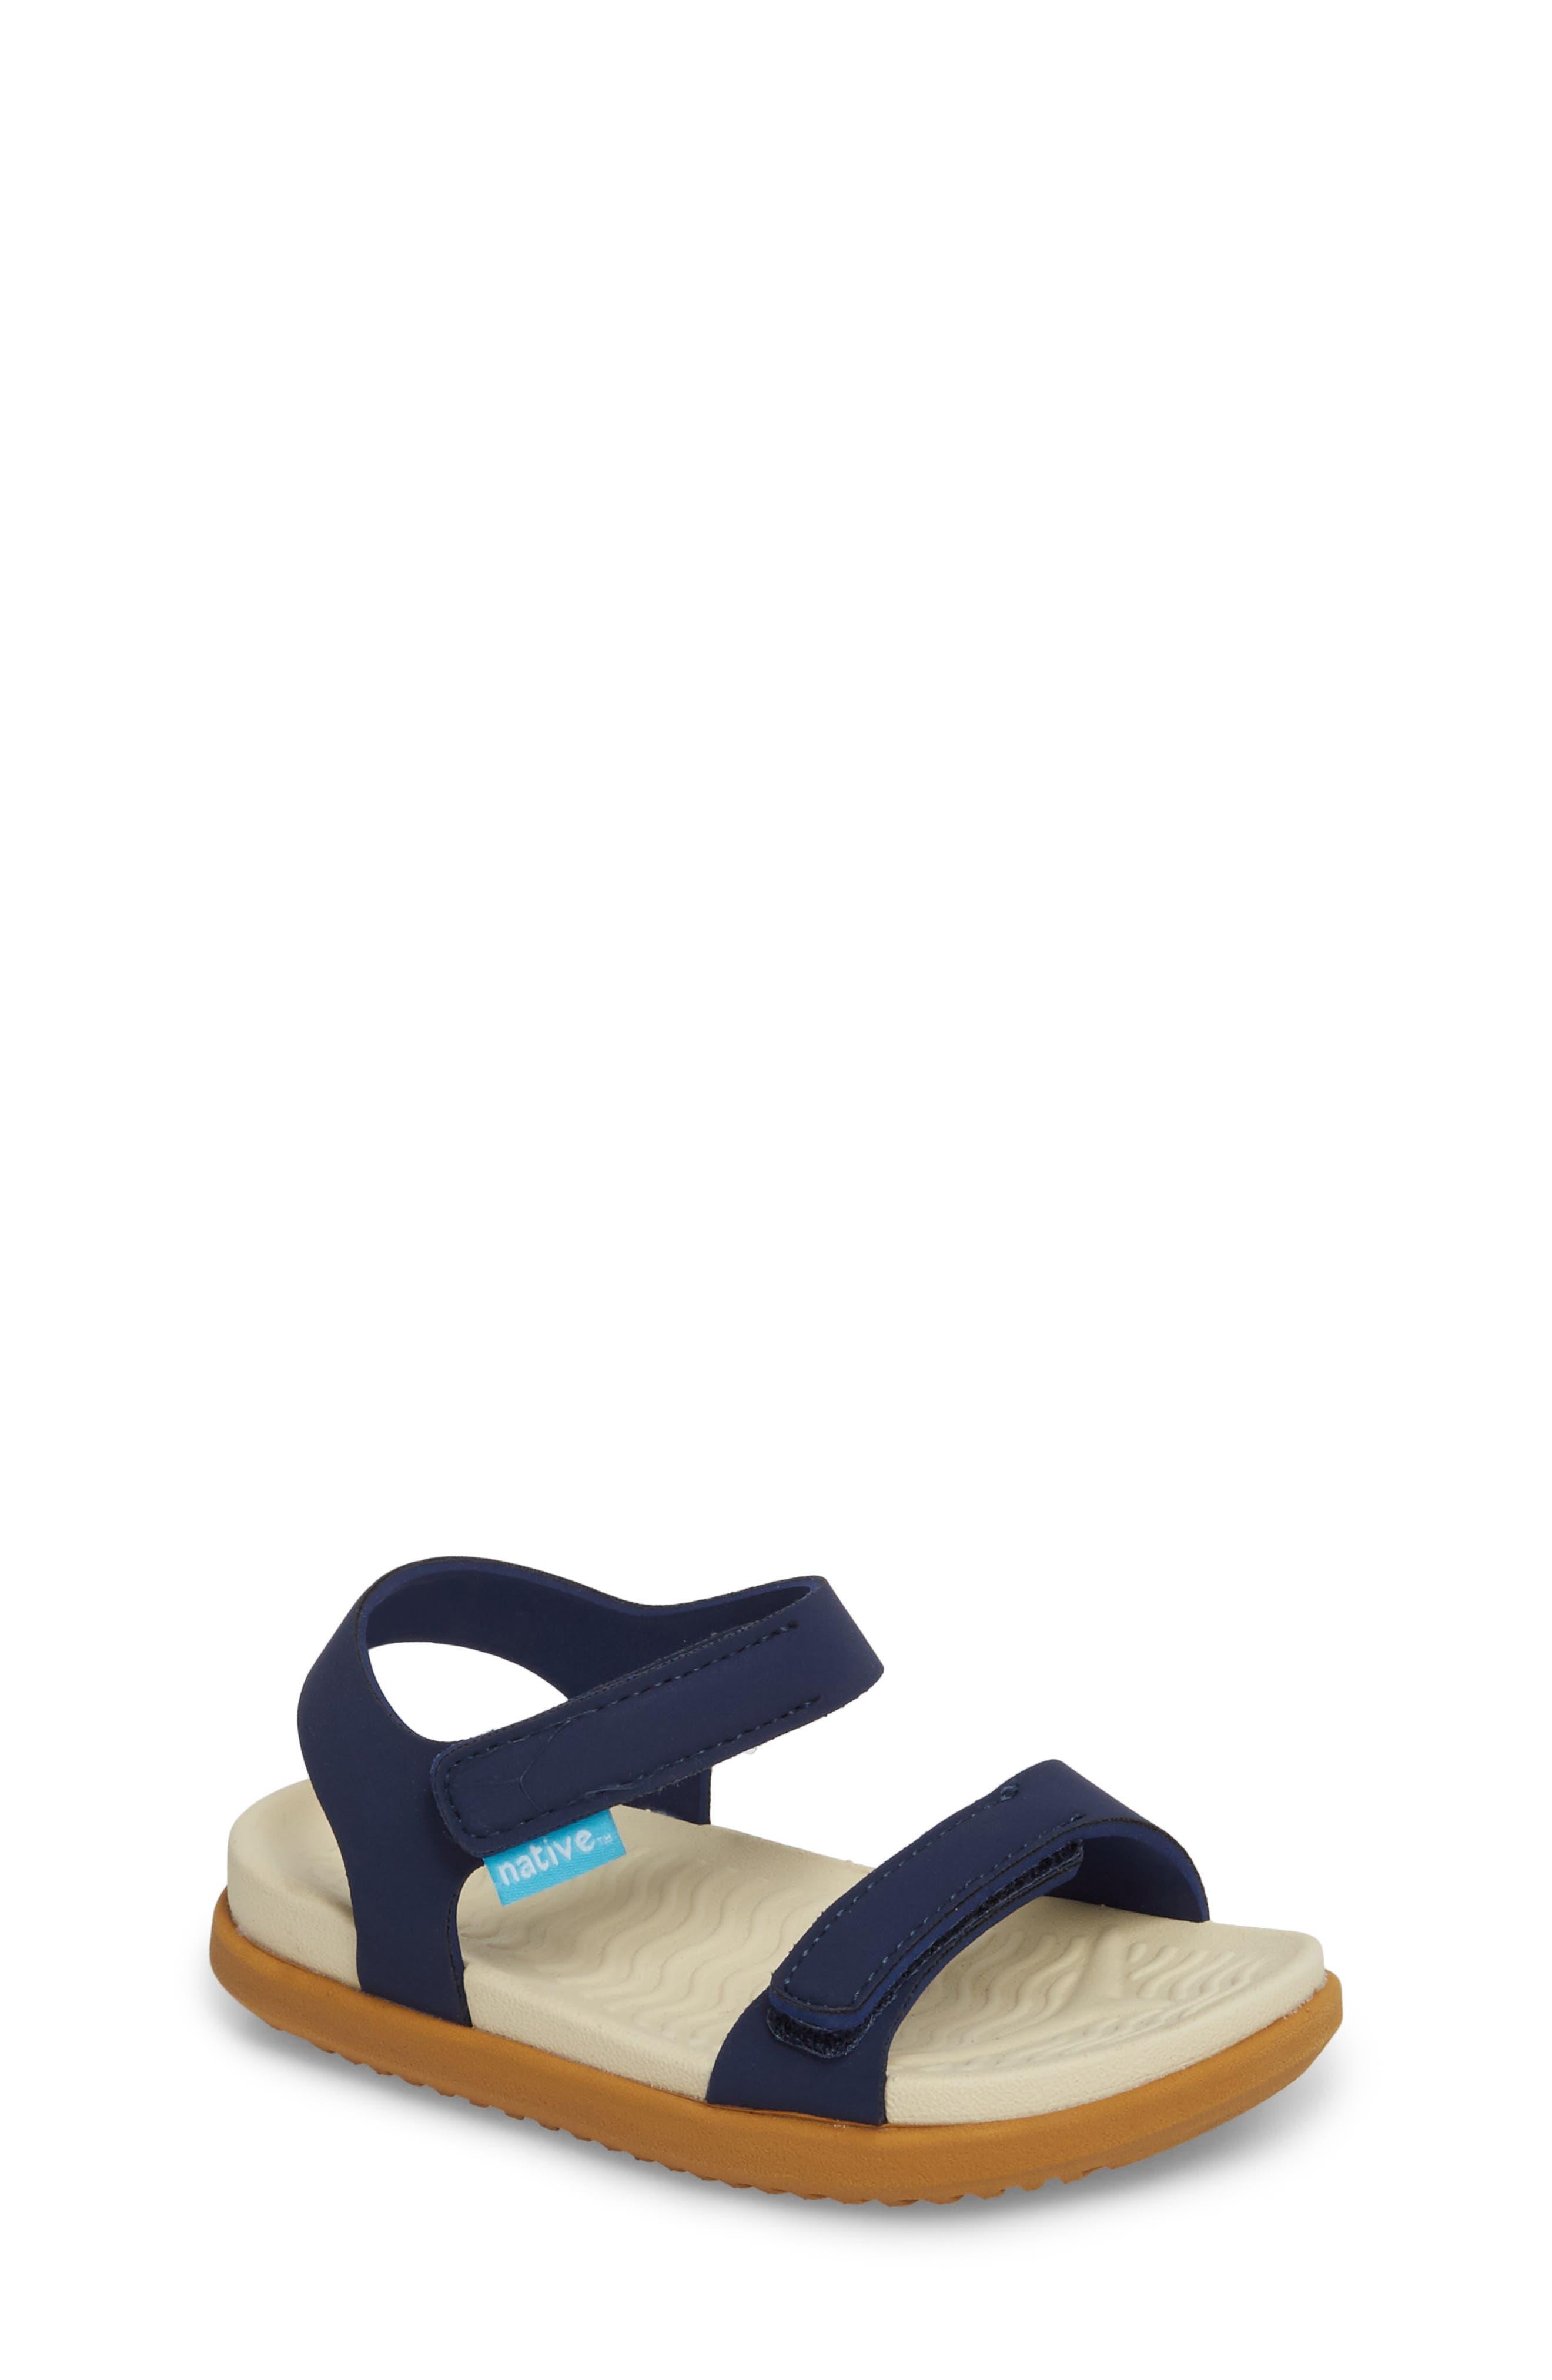 Charley Child Waterproof Flat Sandal,                         Main,                         color, Blue/ Bone White/ Toffee